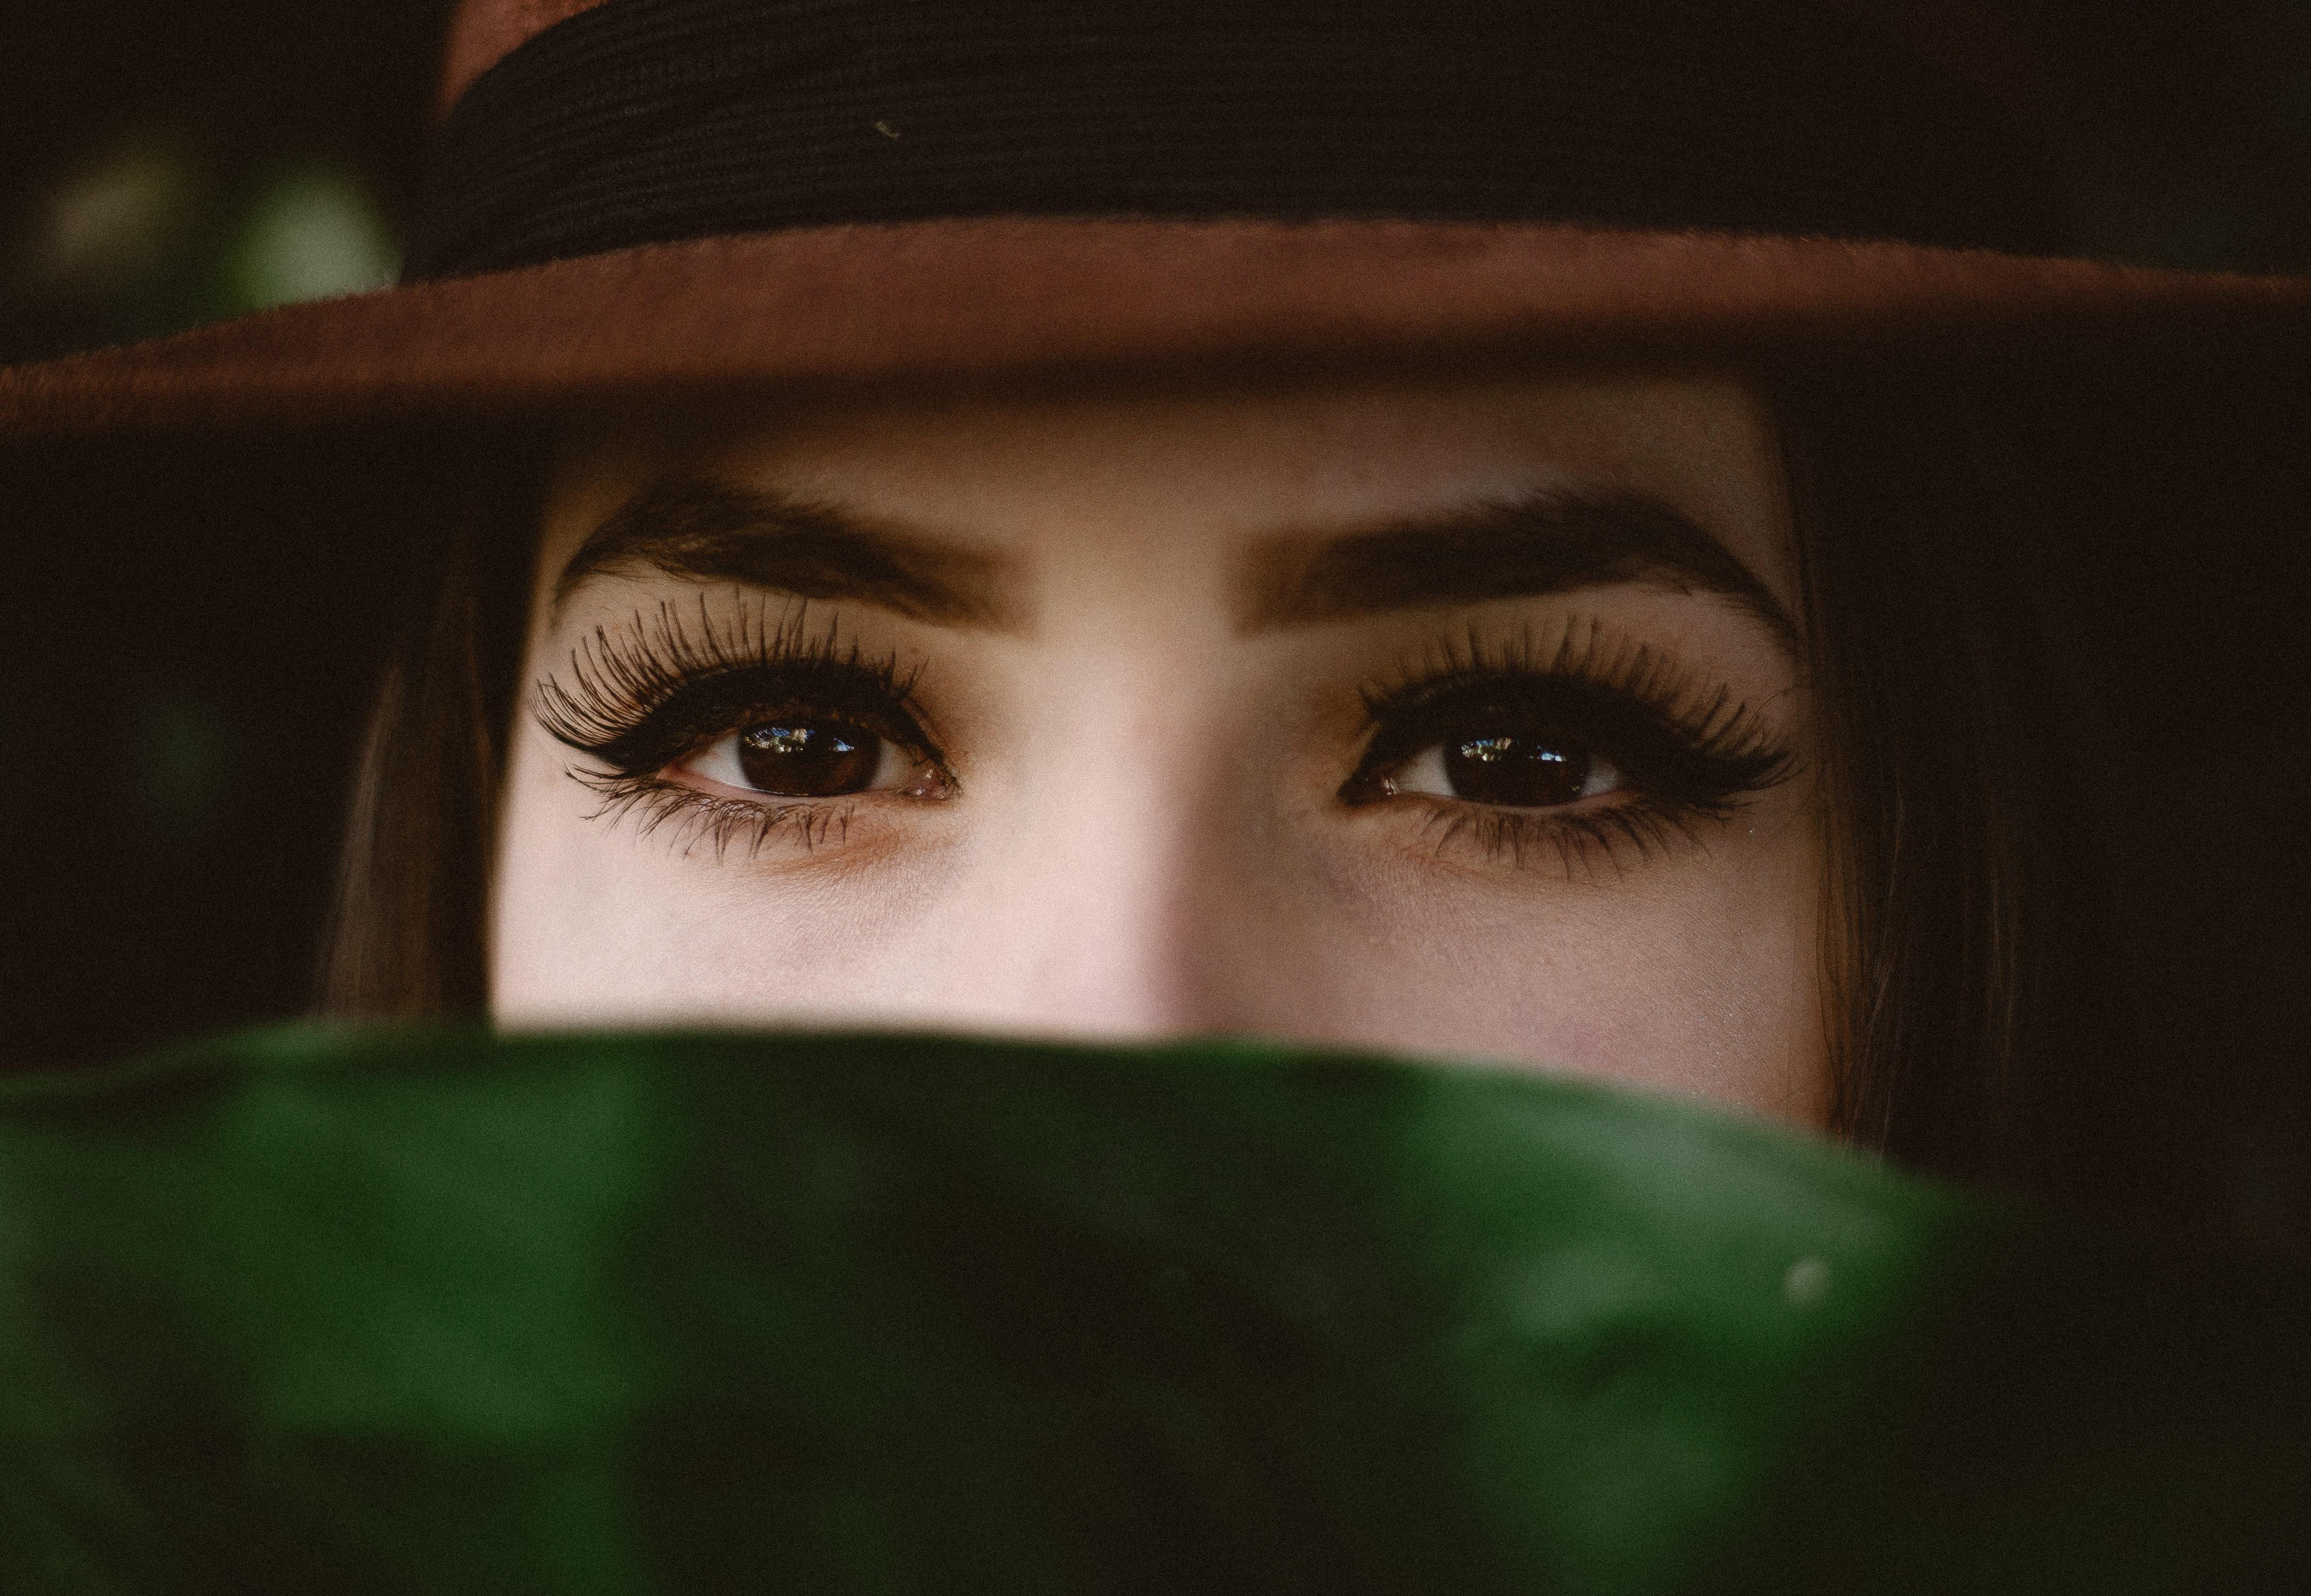 allef vinicius  H4iwsvqKMI unsplash - Dine muligheder for perfekte øjenbryn